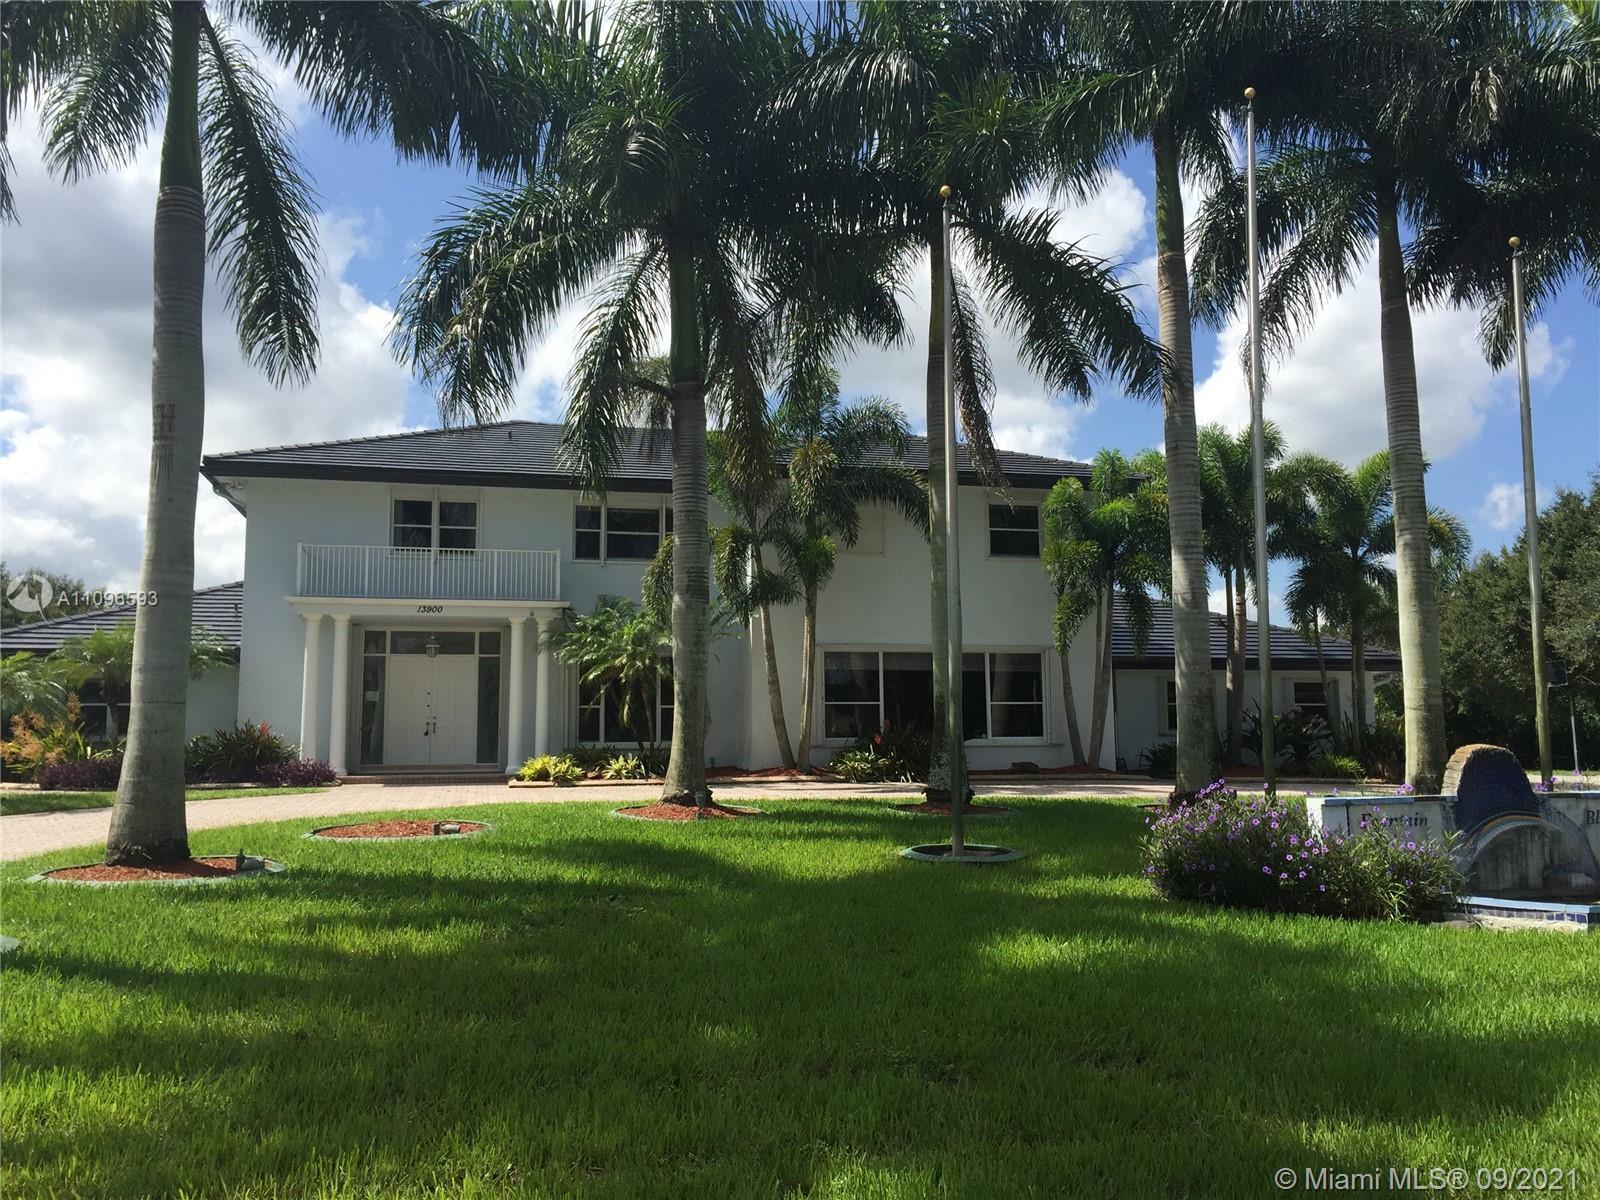 FLA Fruit Lands - 13900 SW 24th St, Davie, FL 33325